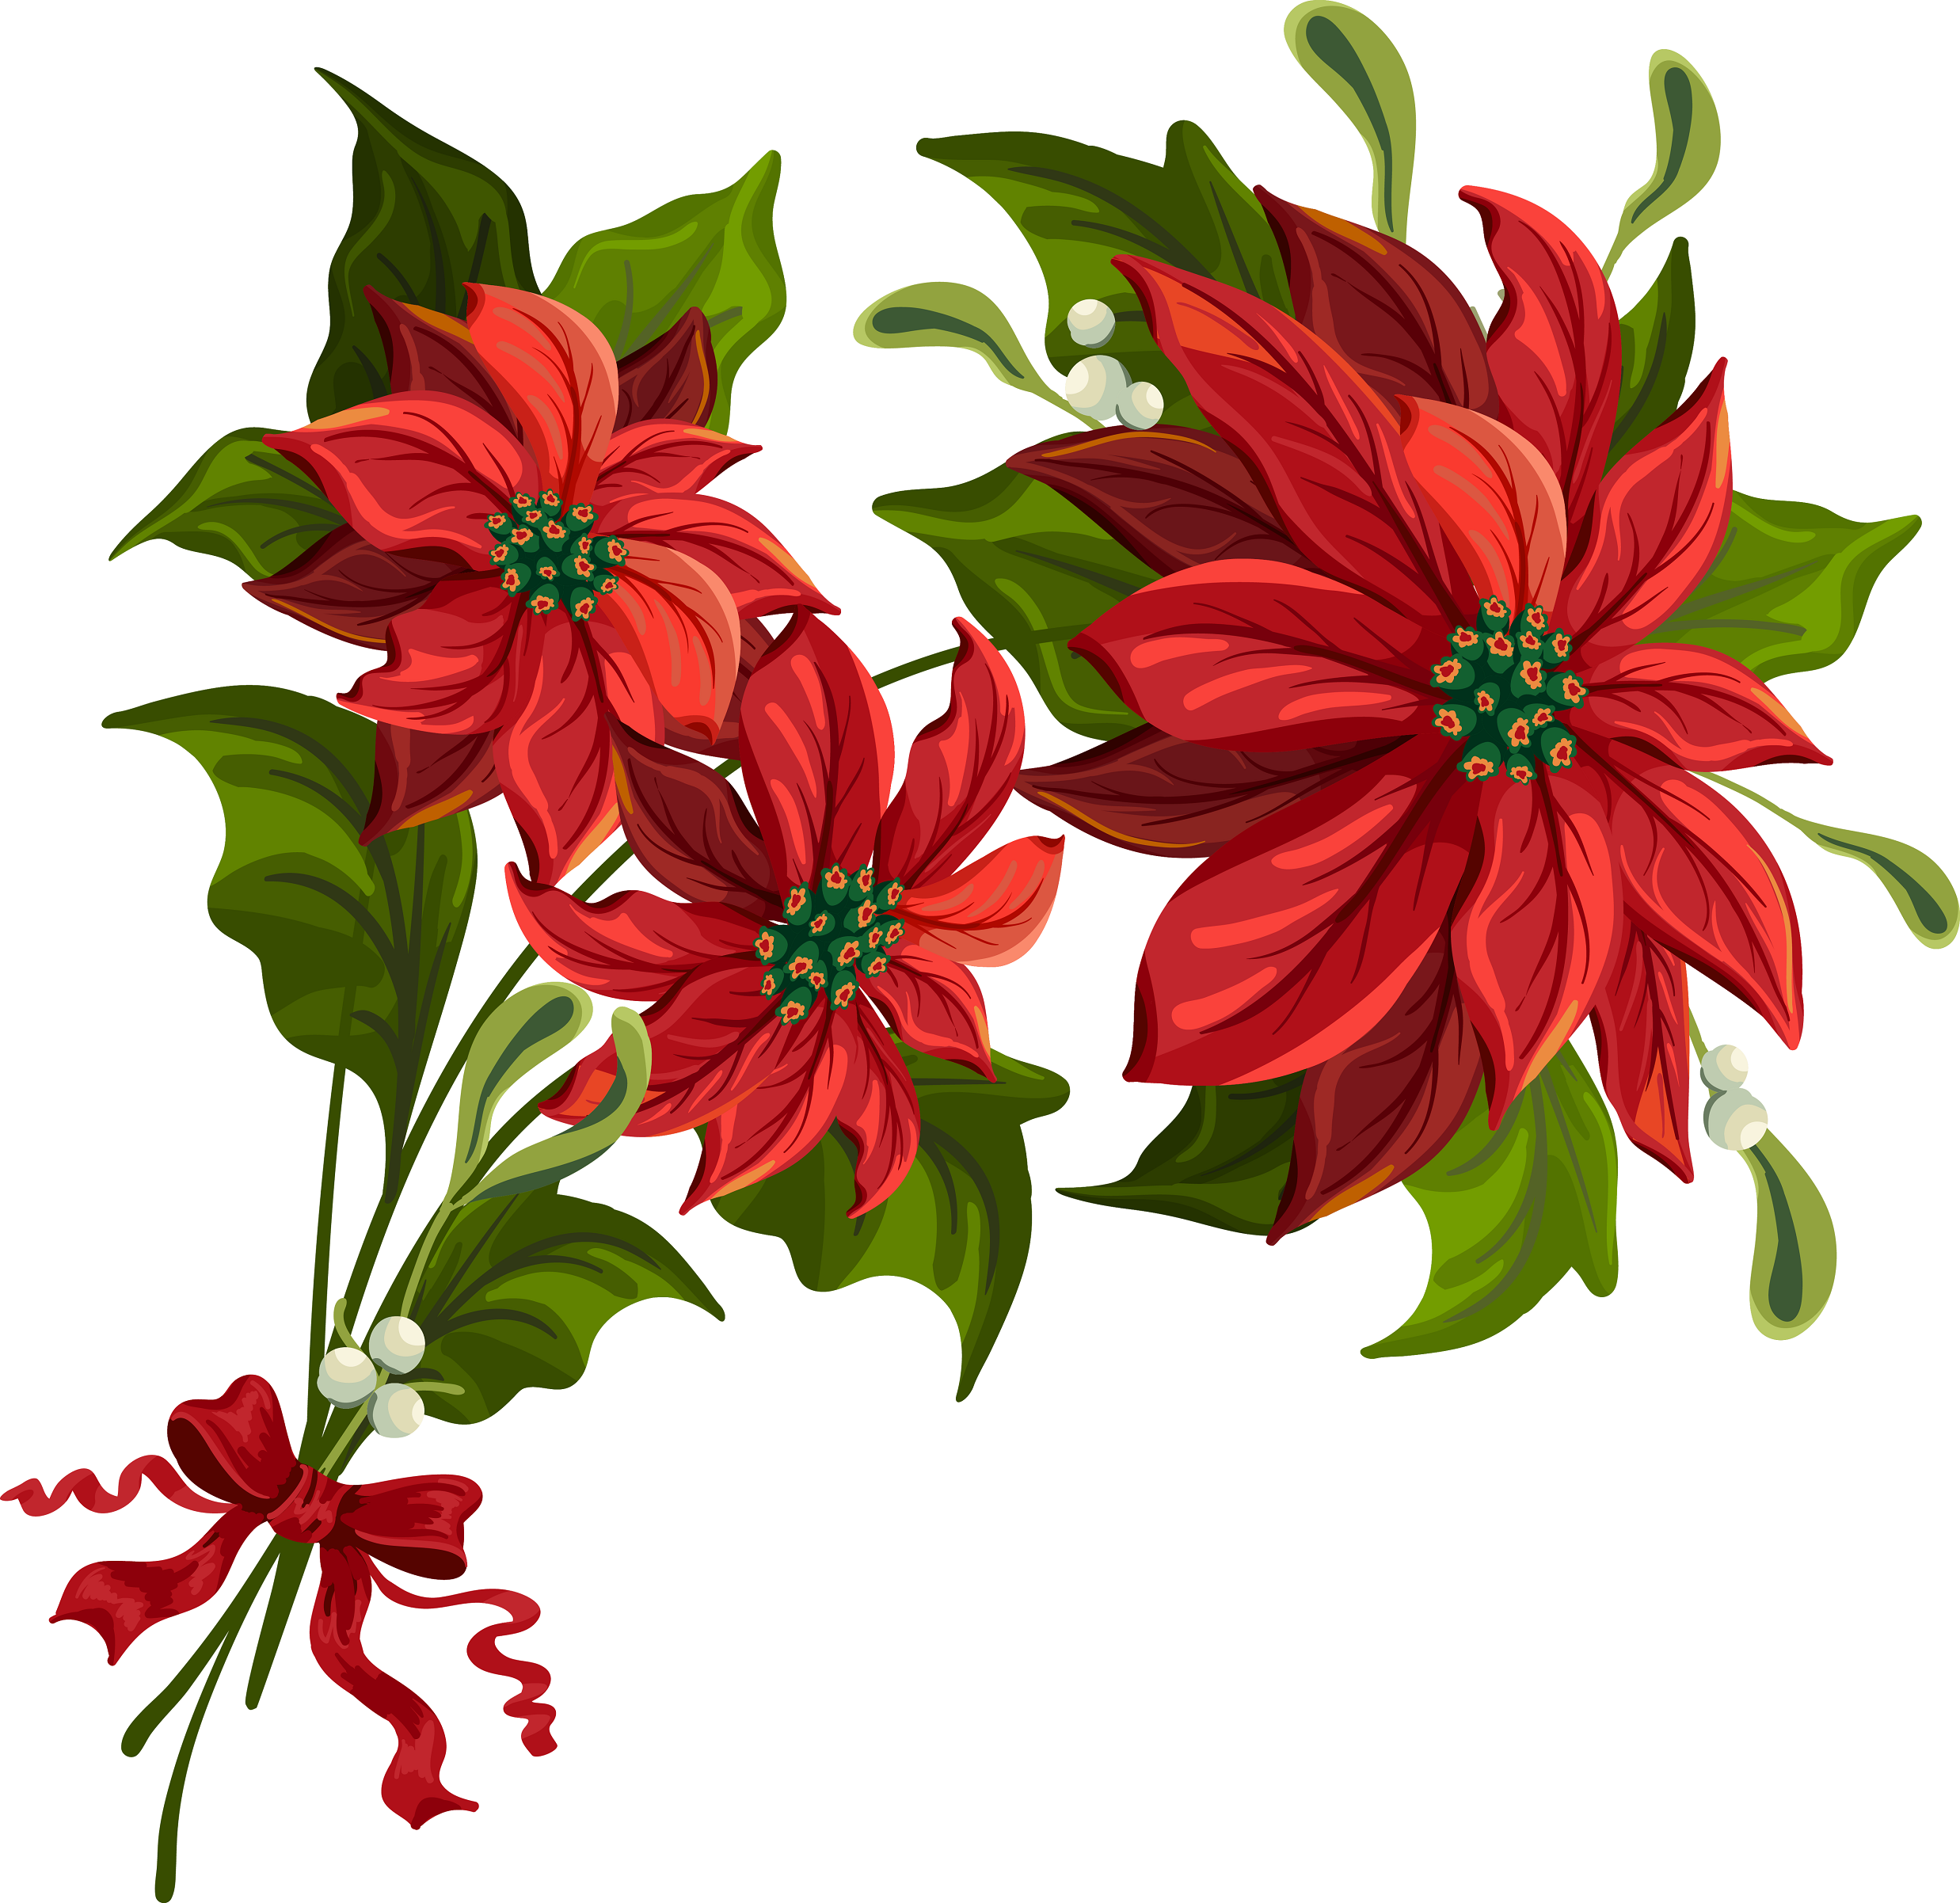 Poinsettia clipart Art poinsettia Holiday  Scrapbook